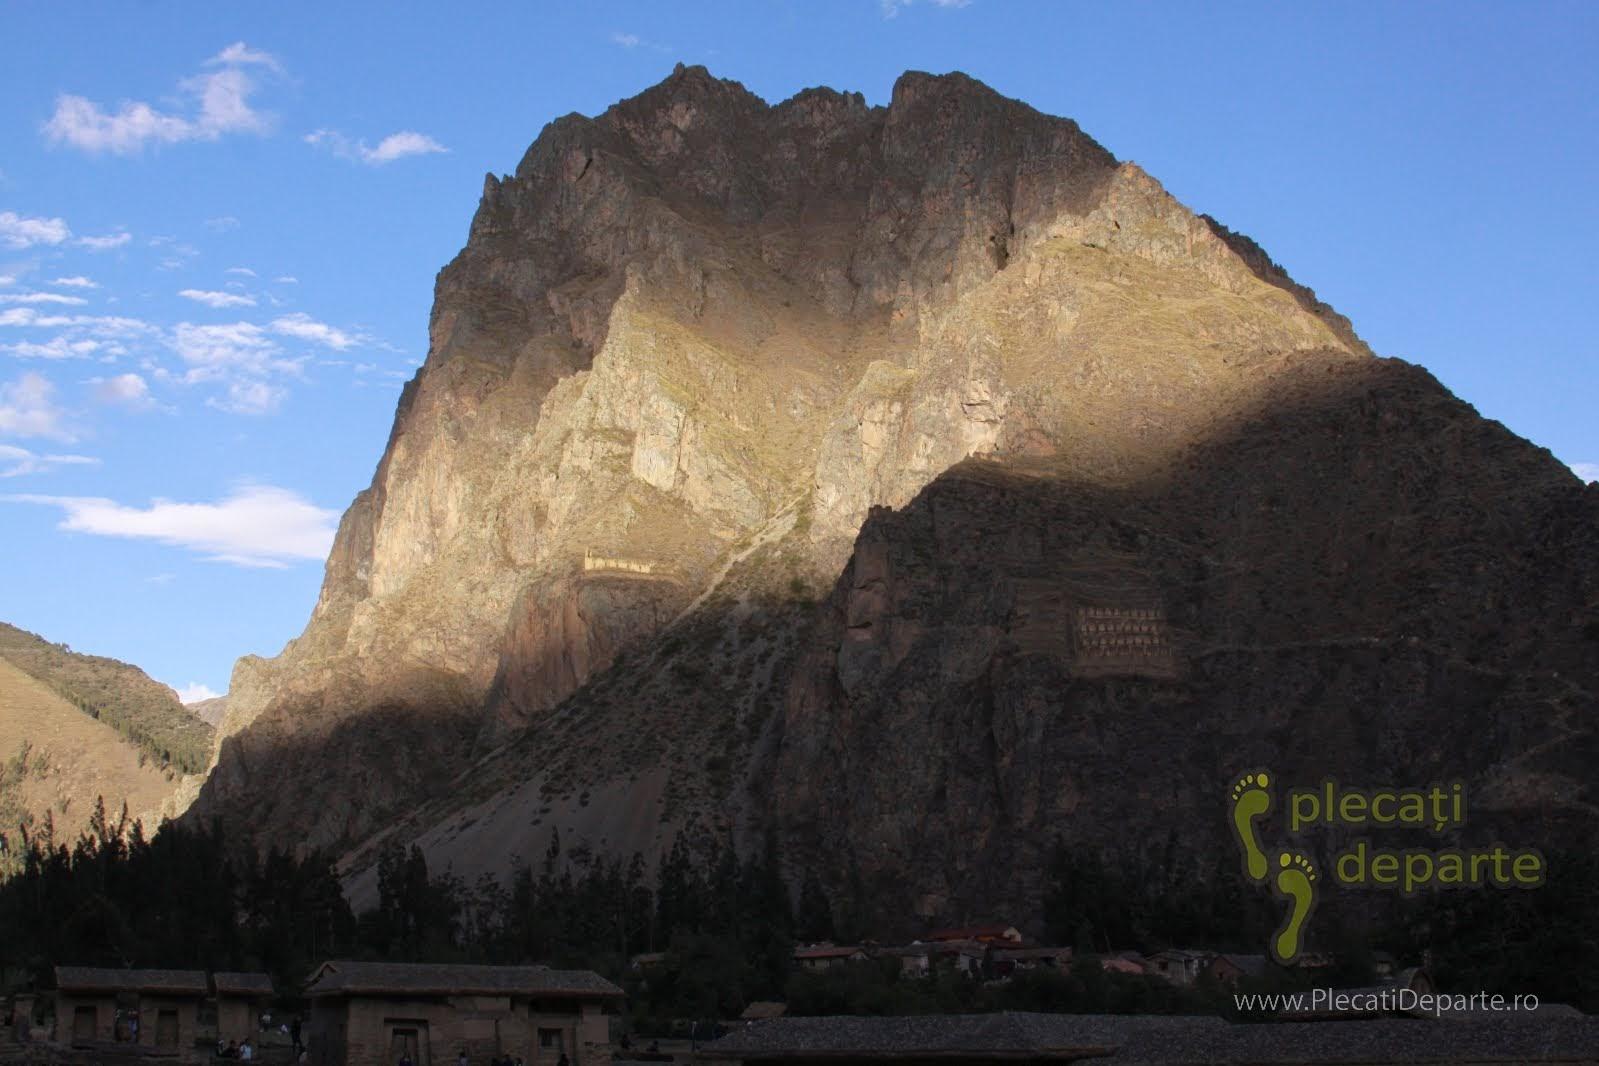 muntele Pinkuylluna, vazut din Ollantaytambo, un obiectiv turistic din Valea Sacra, Peru